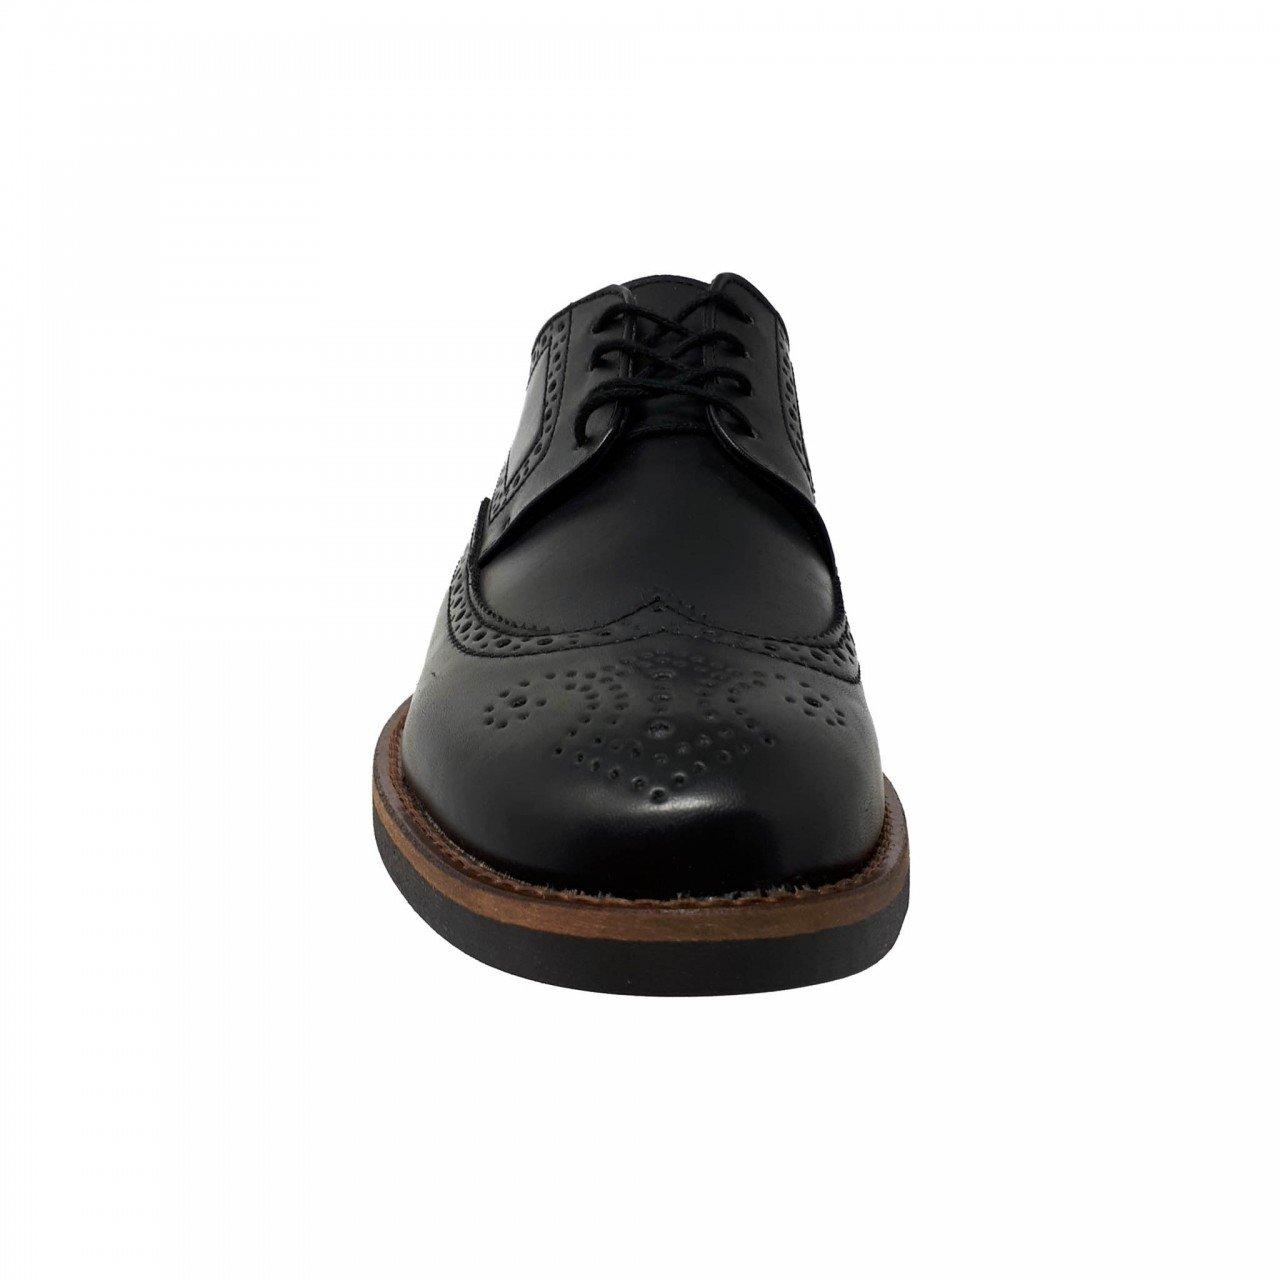 Zapato choclo negro para hombre M4038